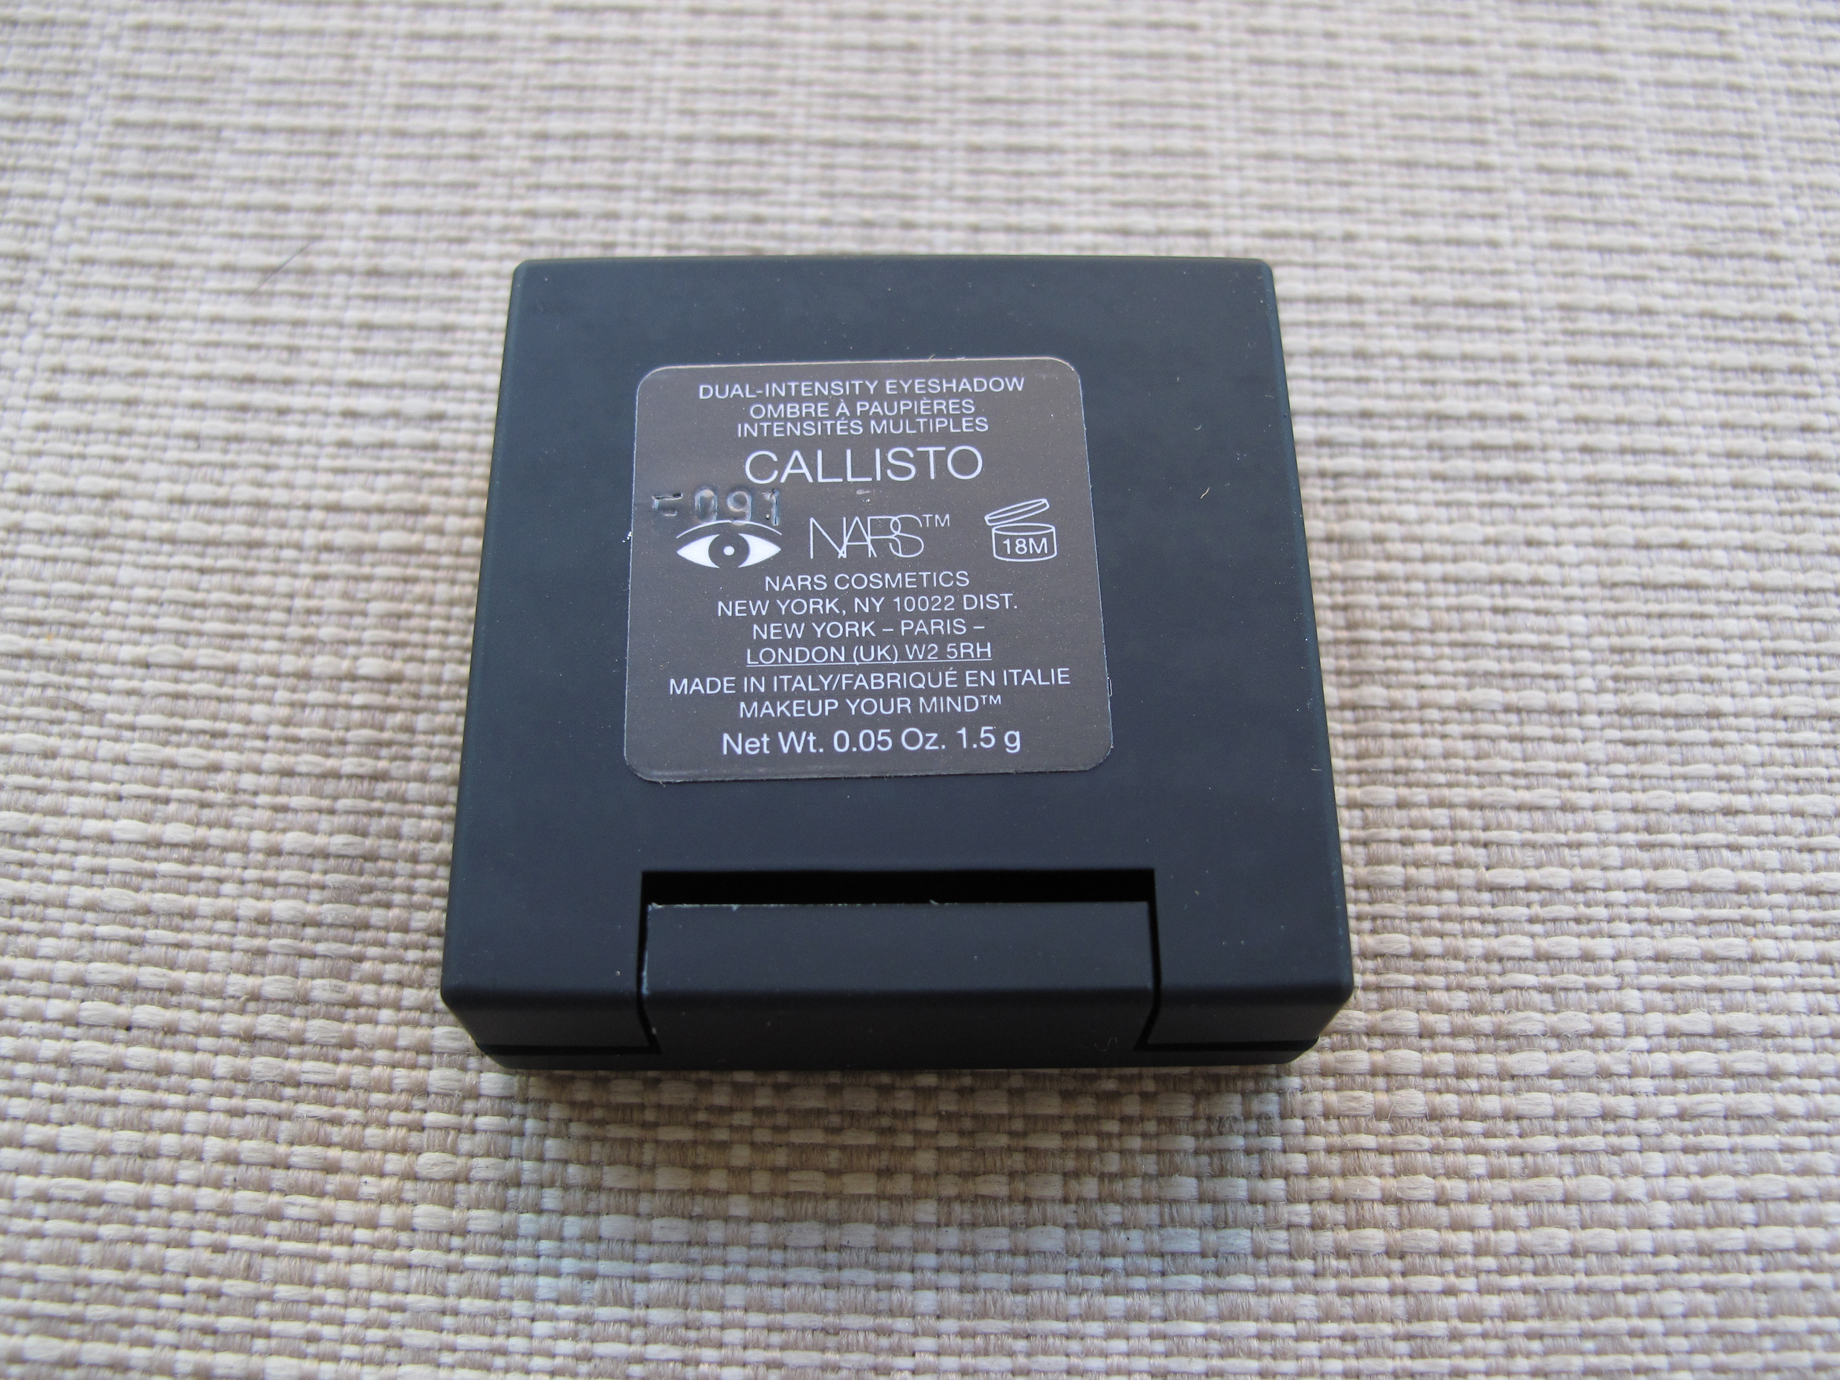 Nars - Sombra Callisto - Rótulo